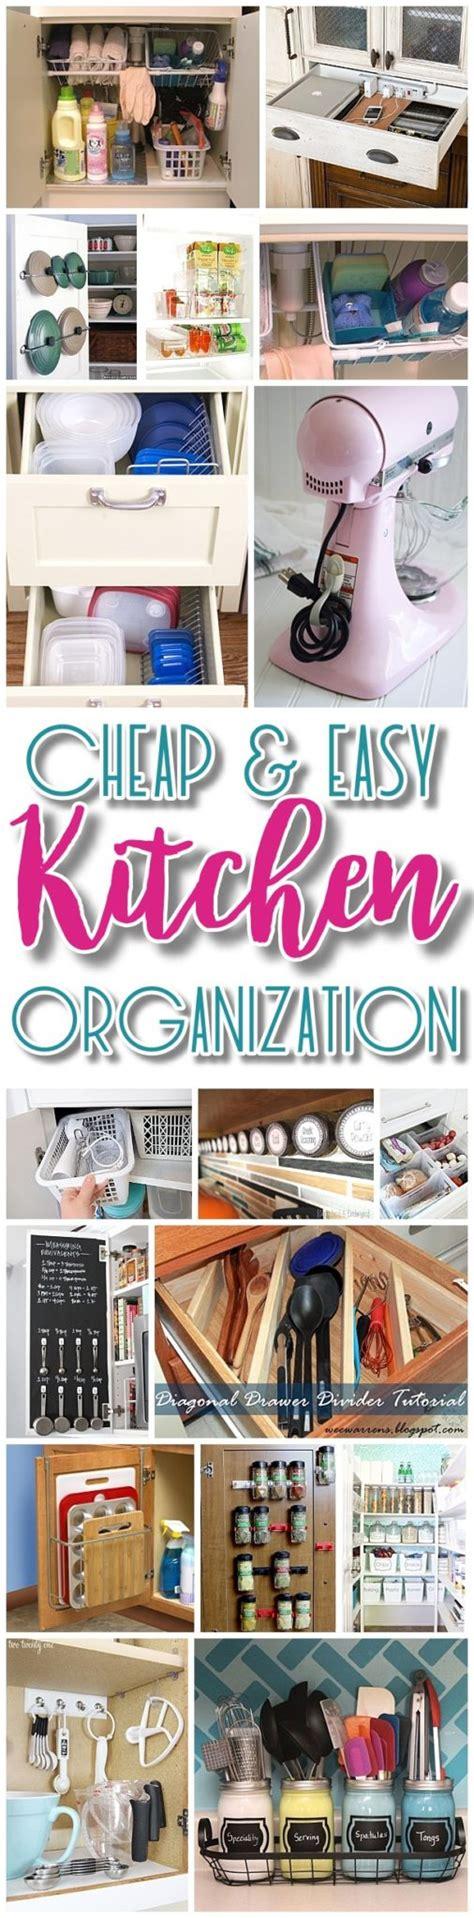 Kitchen Organization Ideas Budget by Easy Budget Friendly Ways To Organize Your Kitchen